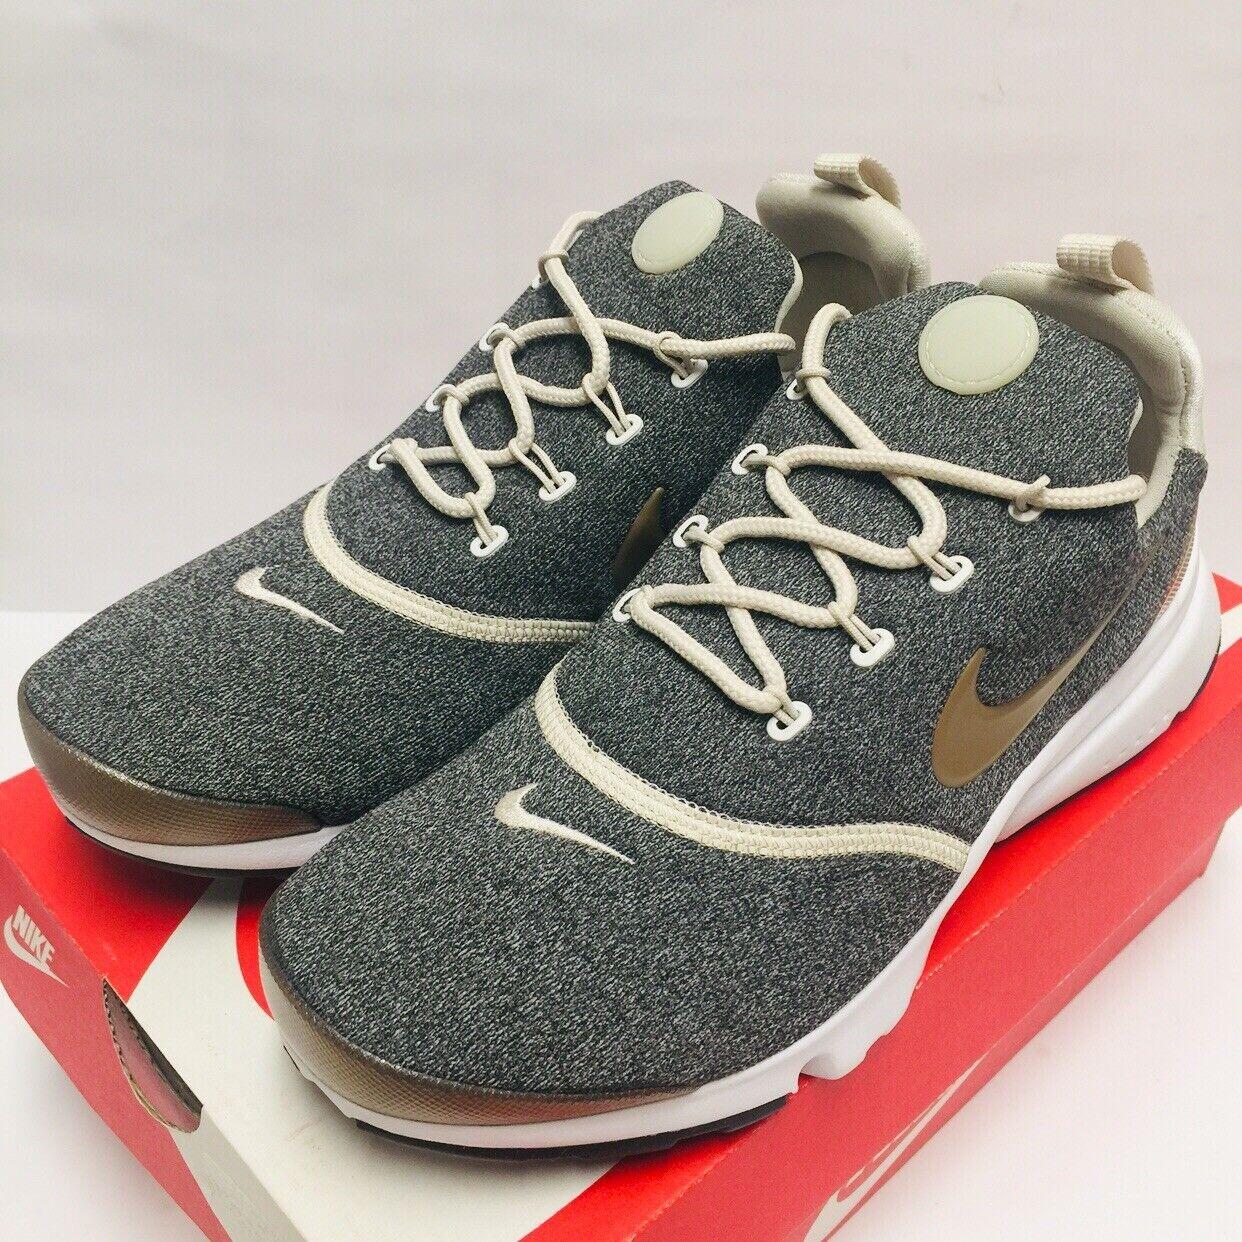 Nike Presto Fly SE  Running scarpe Light Orewood nero (910570 -101) SZ US WNS 8.5  prezzo all'ingrosso